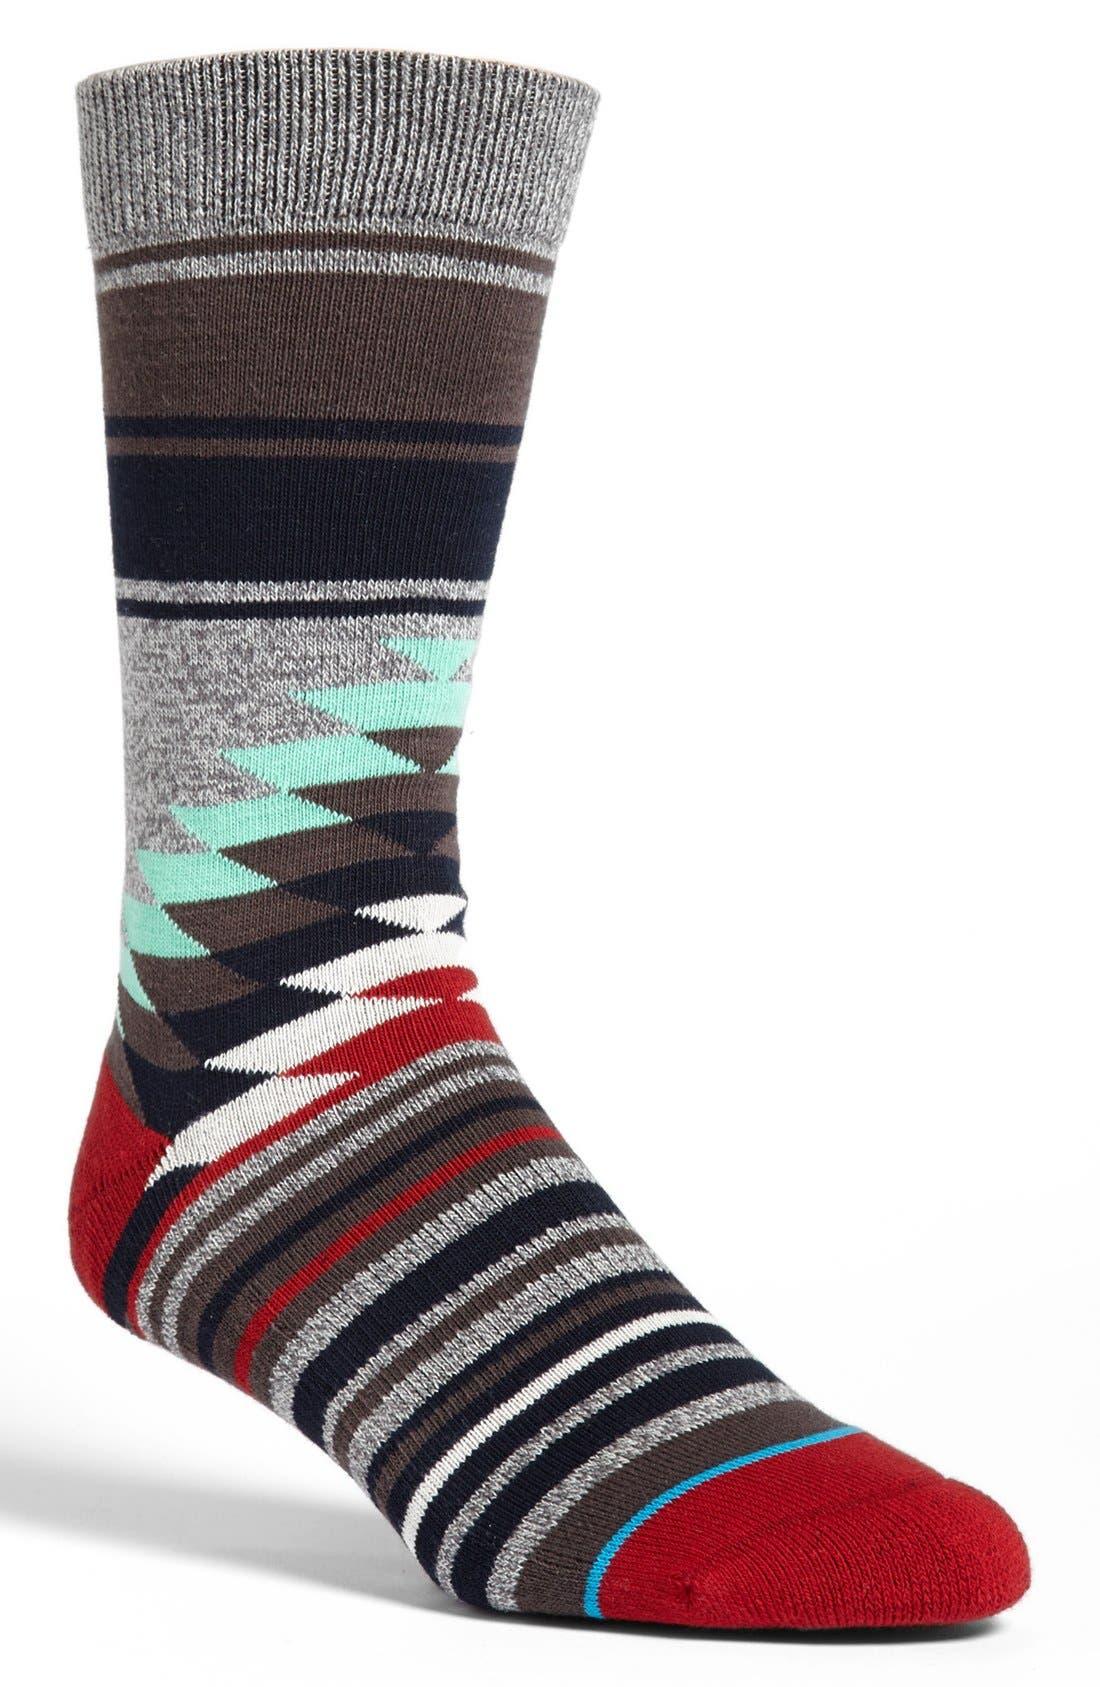 Main Image - Stance 'Laredo' Socks